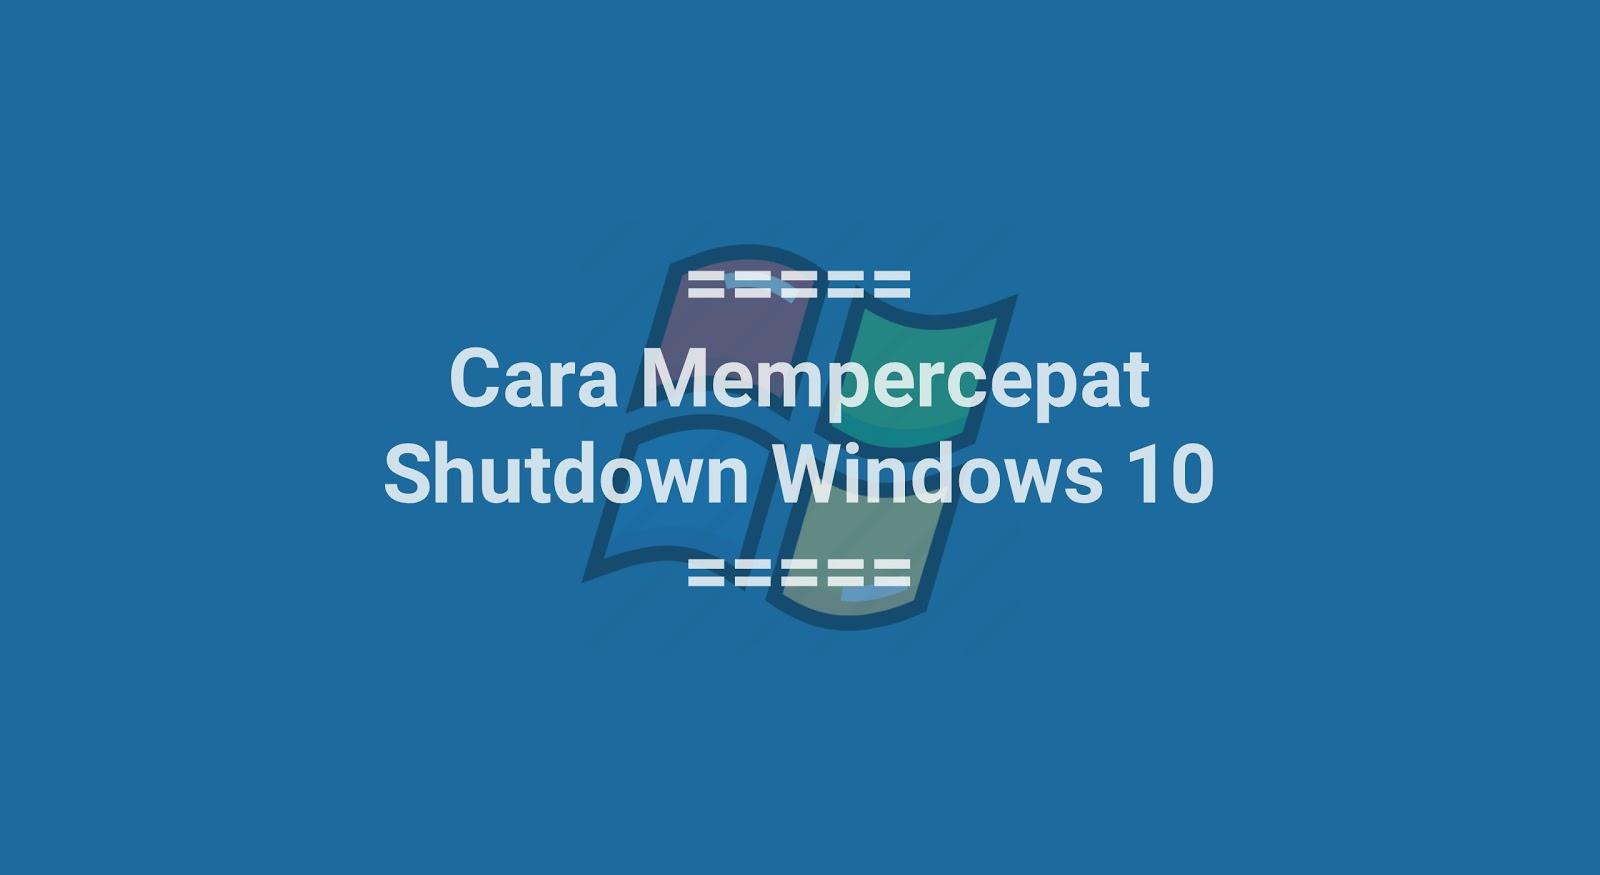 Mempercepat Shutdown Windows 10